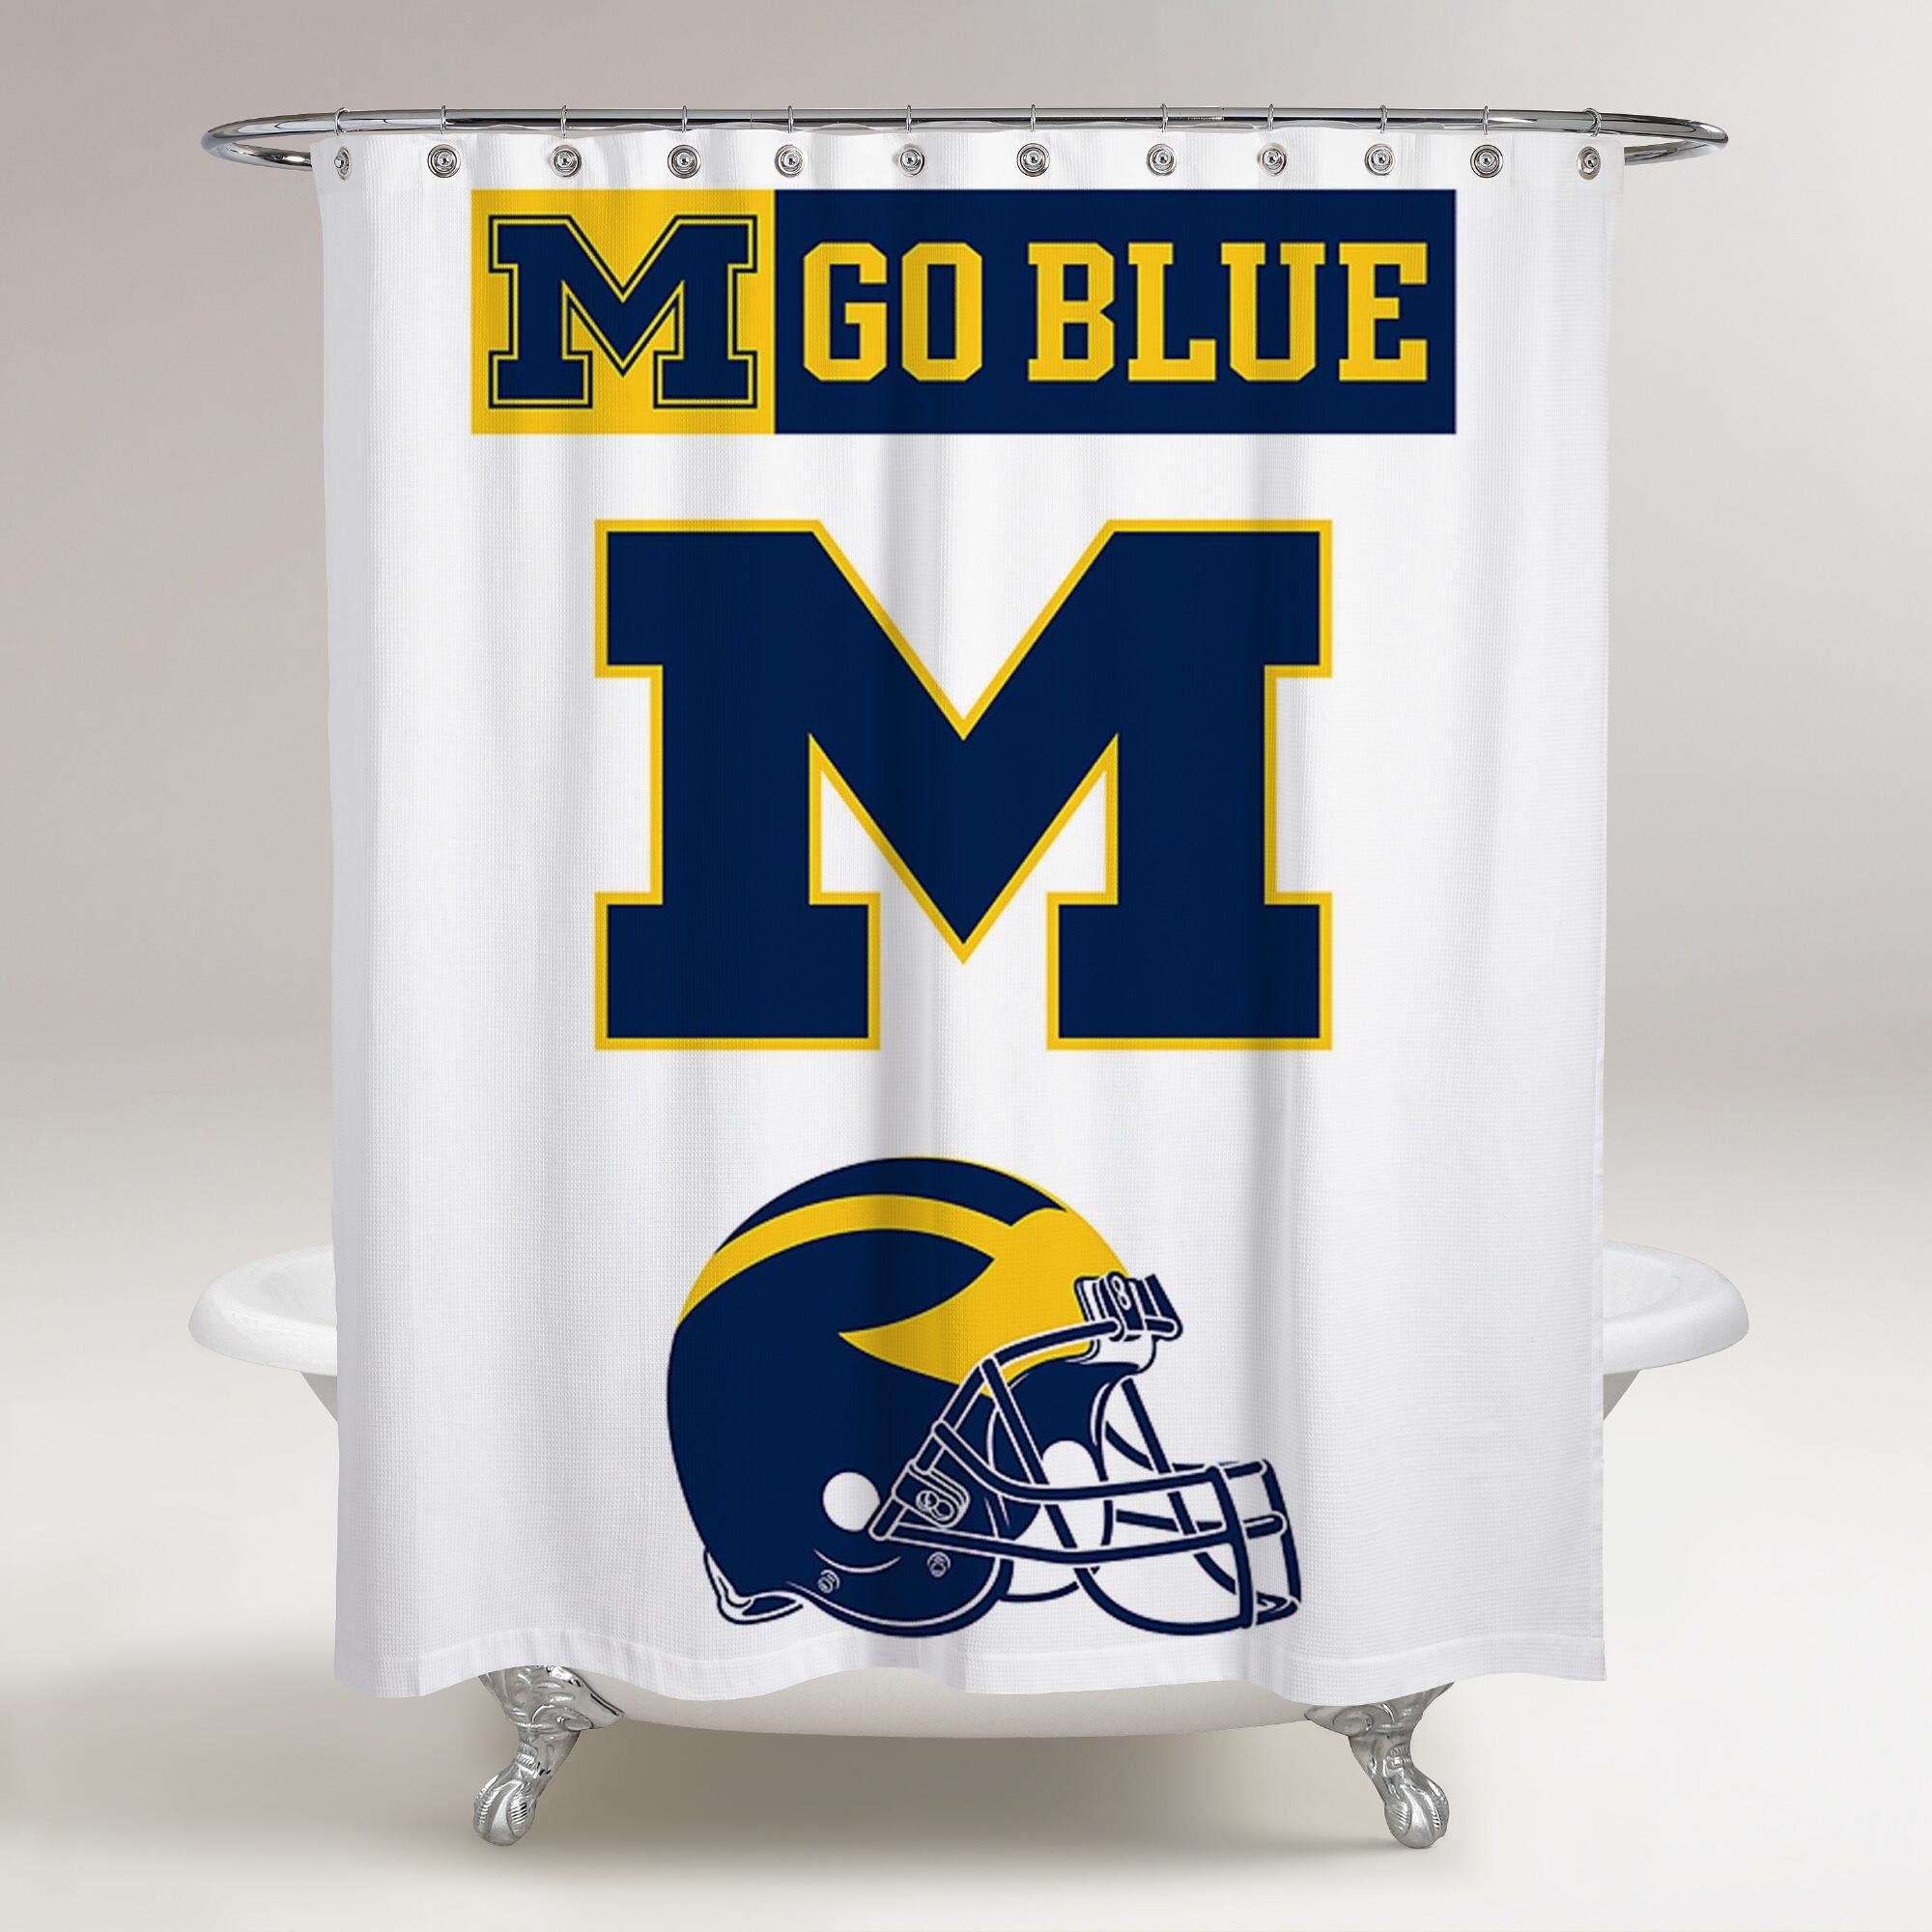 Michigan Wolverines Logo Go Blue Printed Shower Curtain Bathroom Decor Price Free Shipping Posters Bathroom Shower Curtains Go Blue Michigan Wolverines